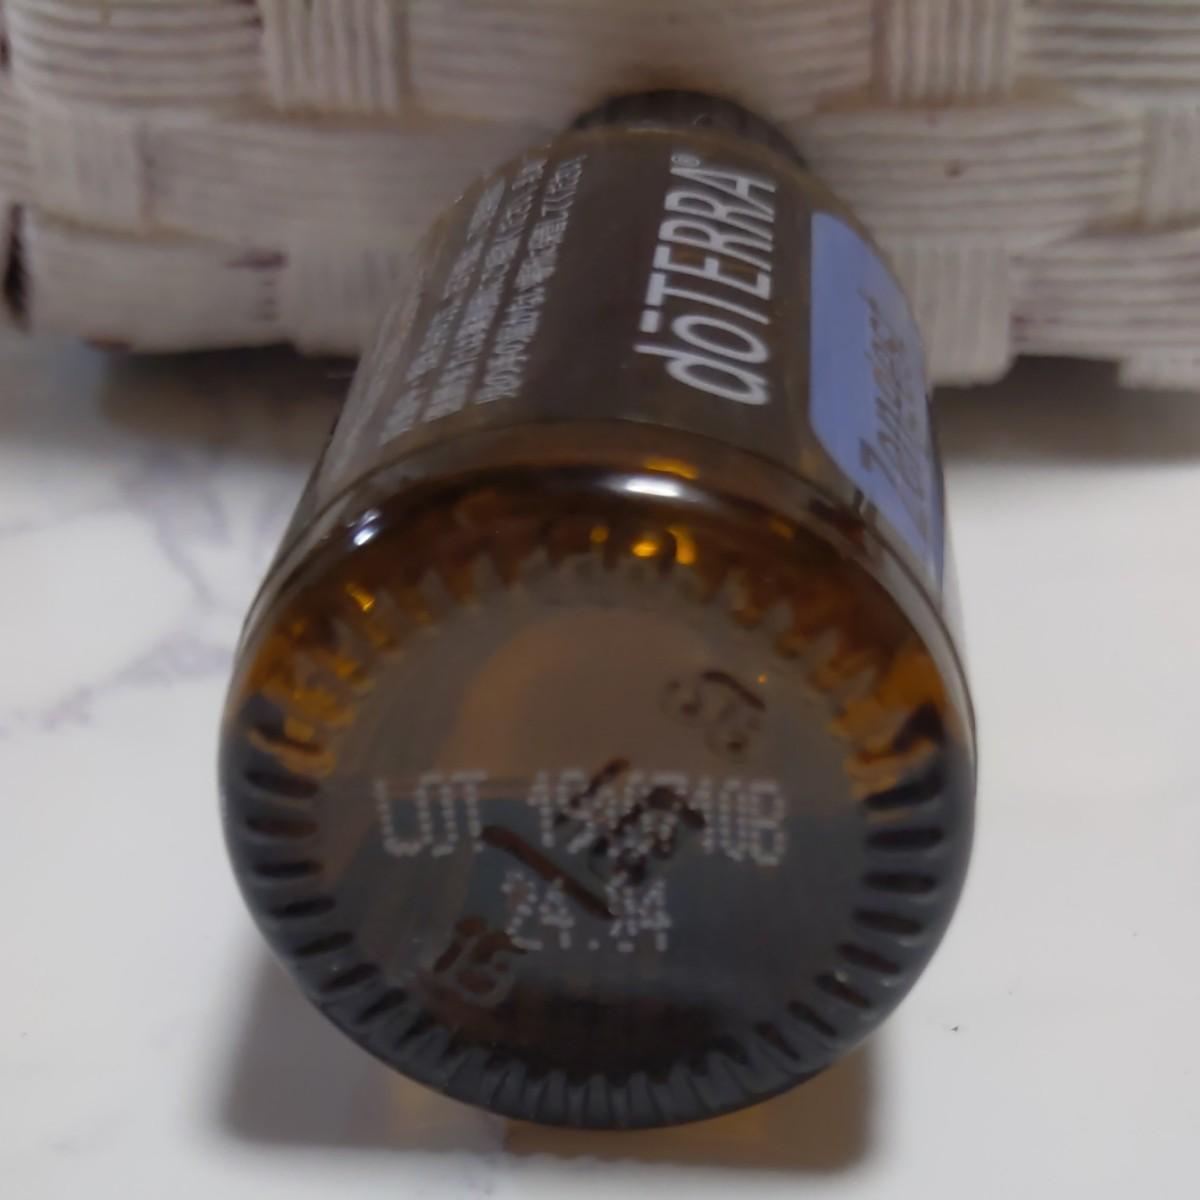 doTERRA ドテラ エッセンシャルオイル アロマオイル ゼンジェスト 15mL